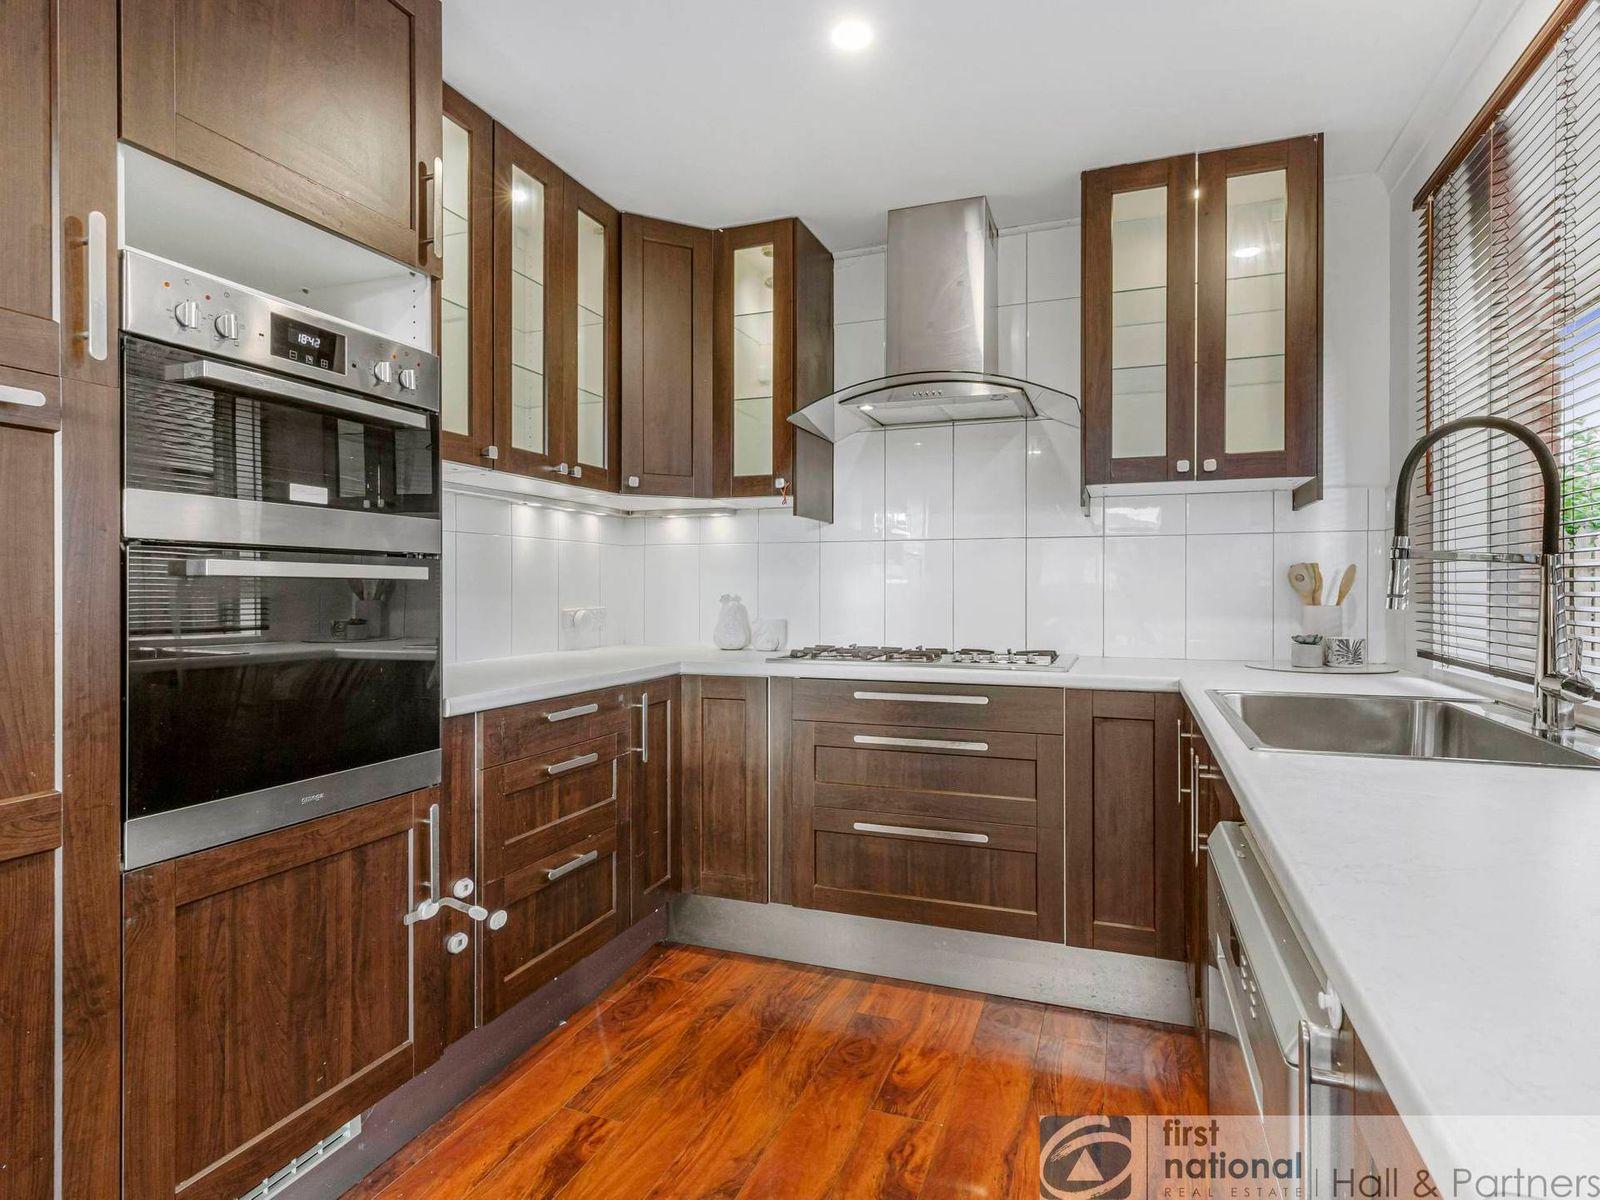 3 James Wyman Place, Hampton Park, VIC 3976